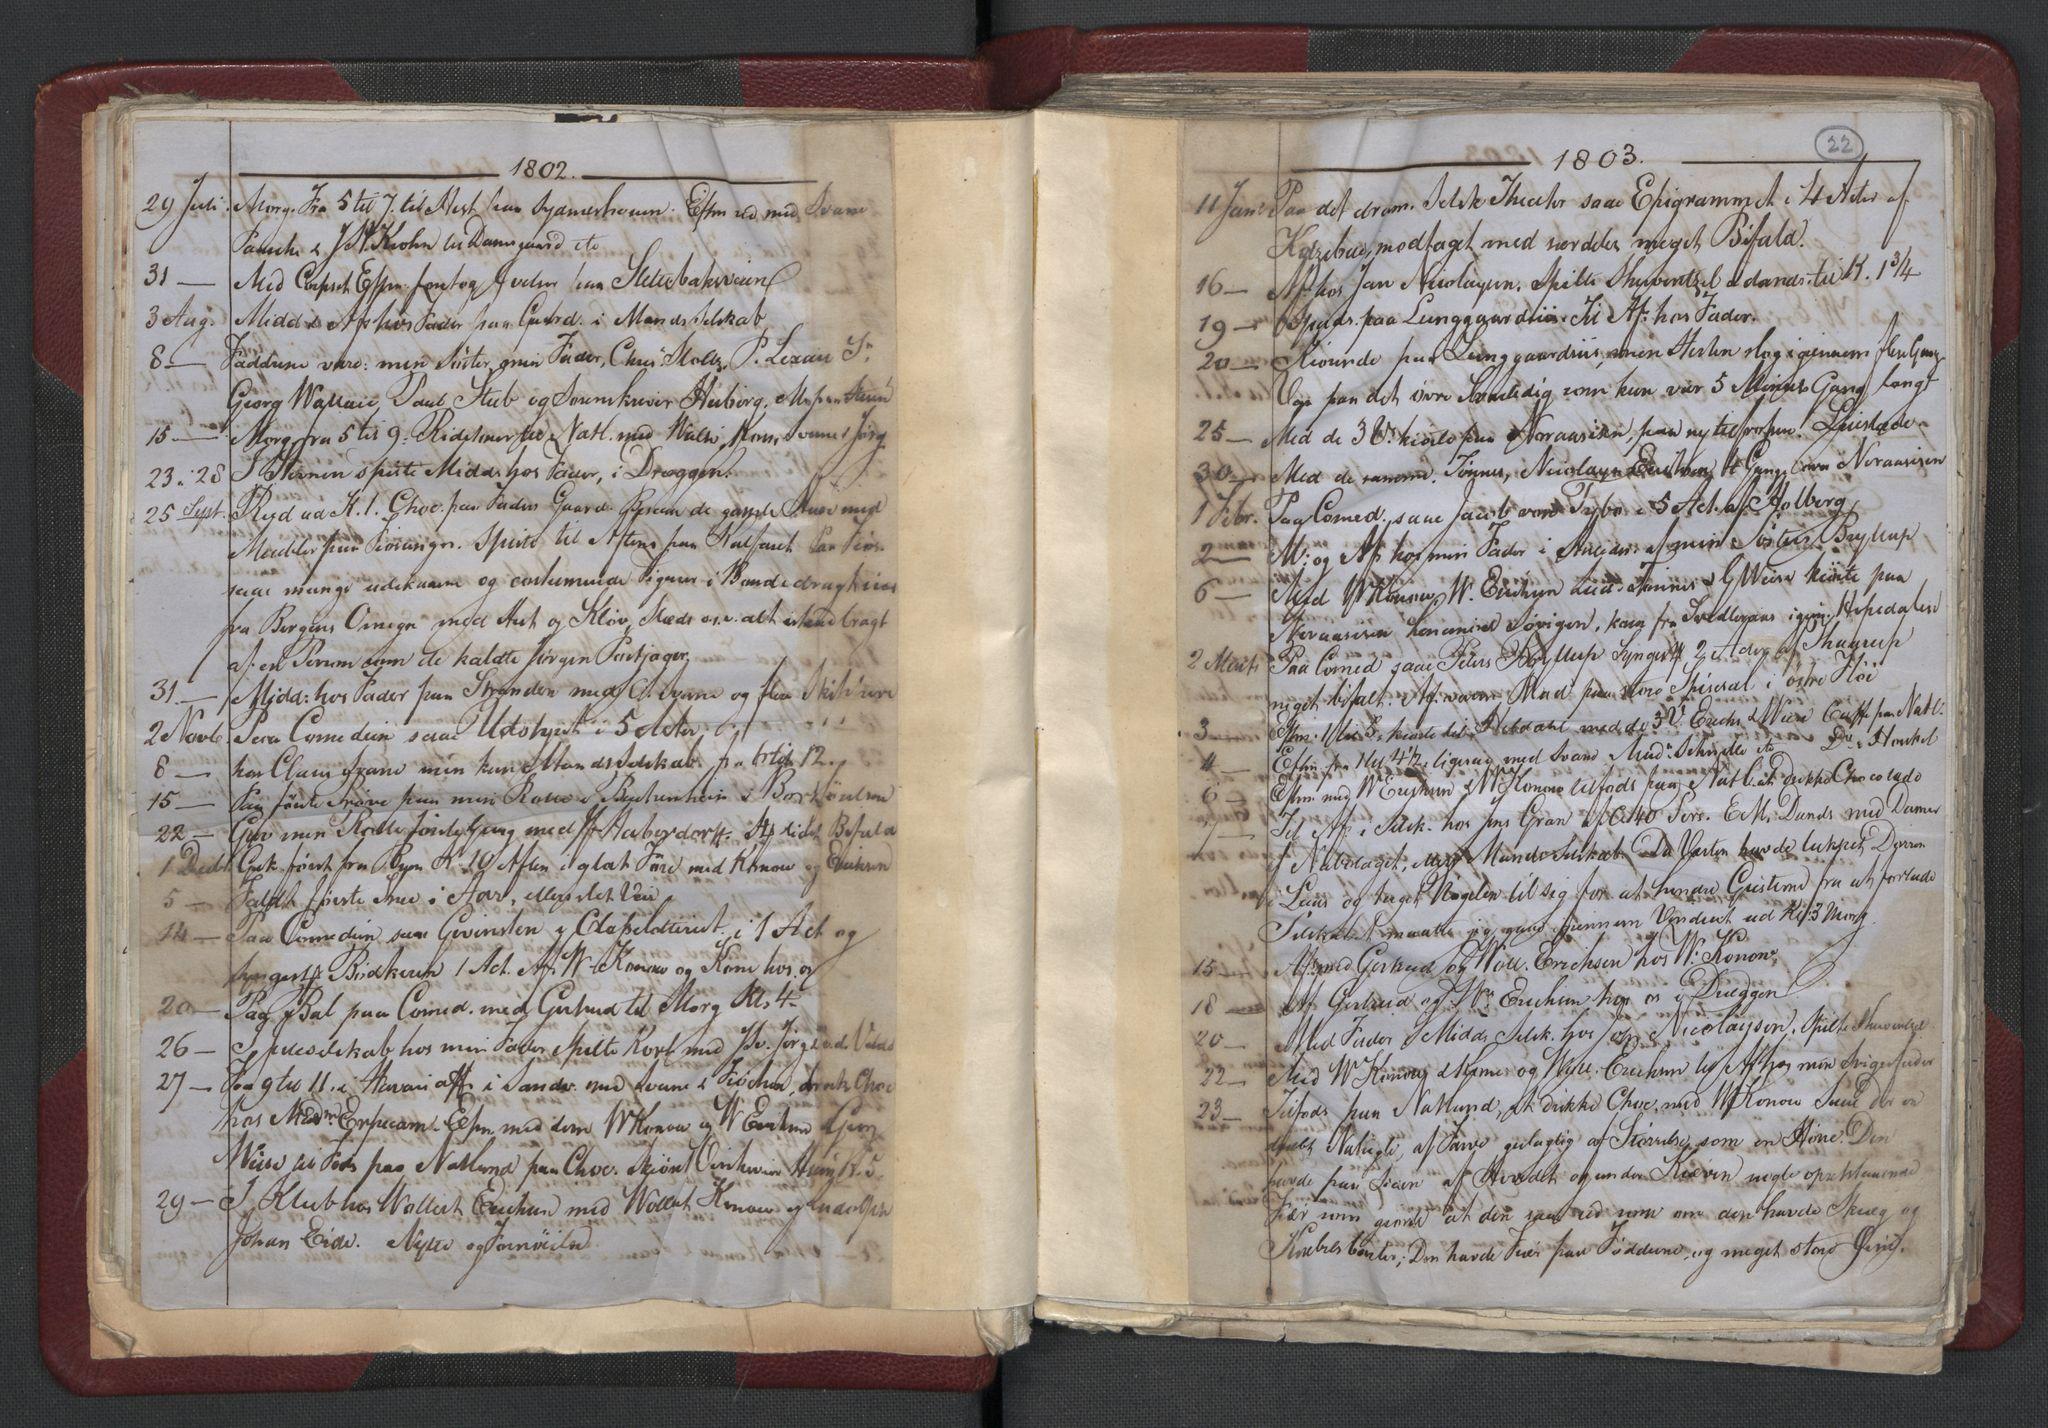 RA, Meltzer, Fredrik, F/L0001: Dagbok for årene 1796-1808, 1811, 1817, 1796-1817, s. 21b-22a